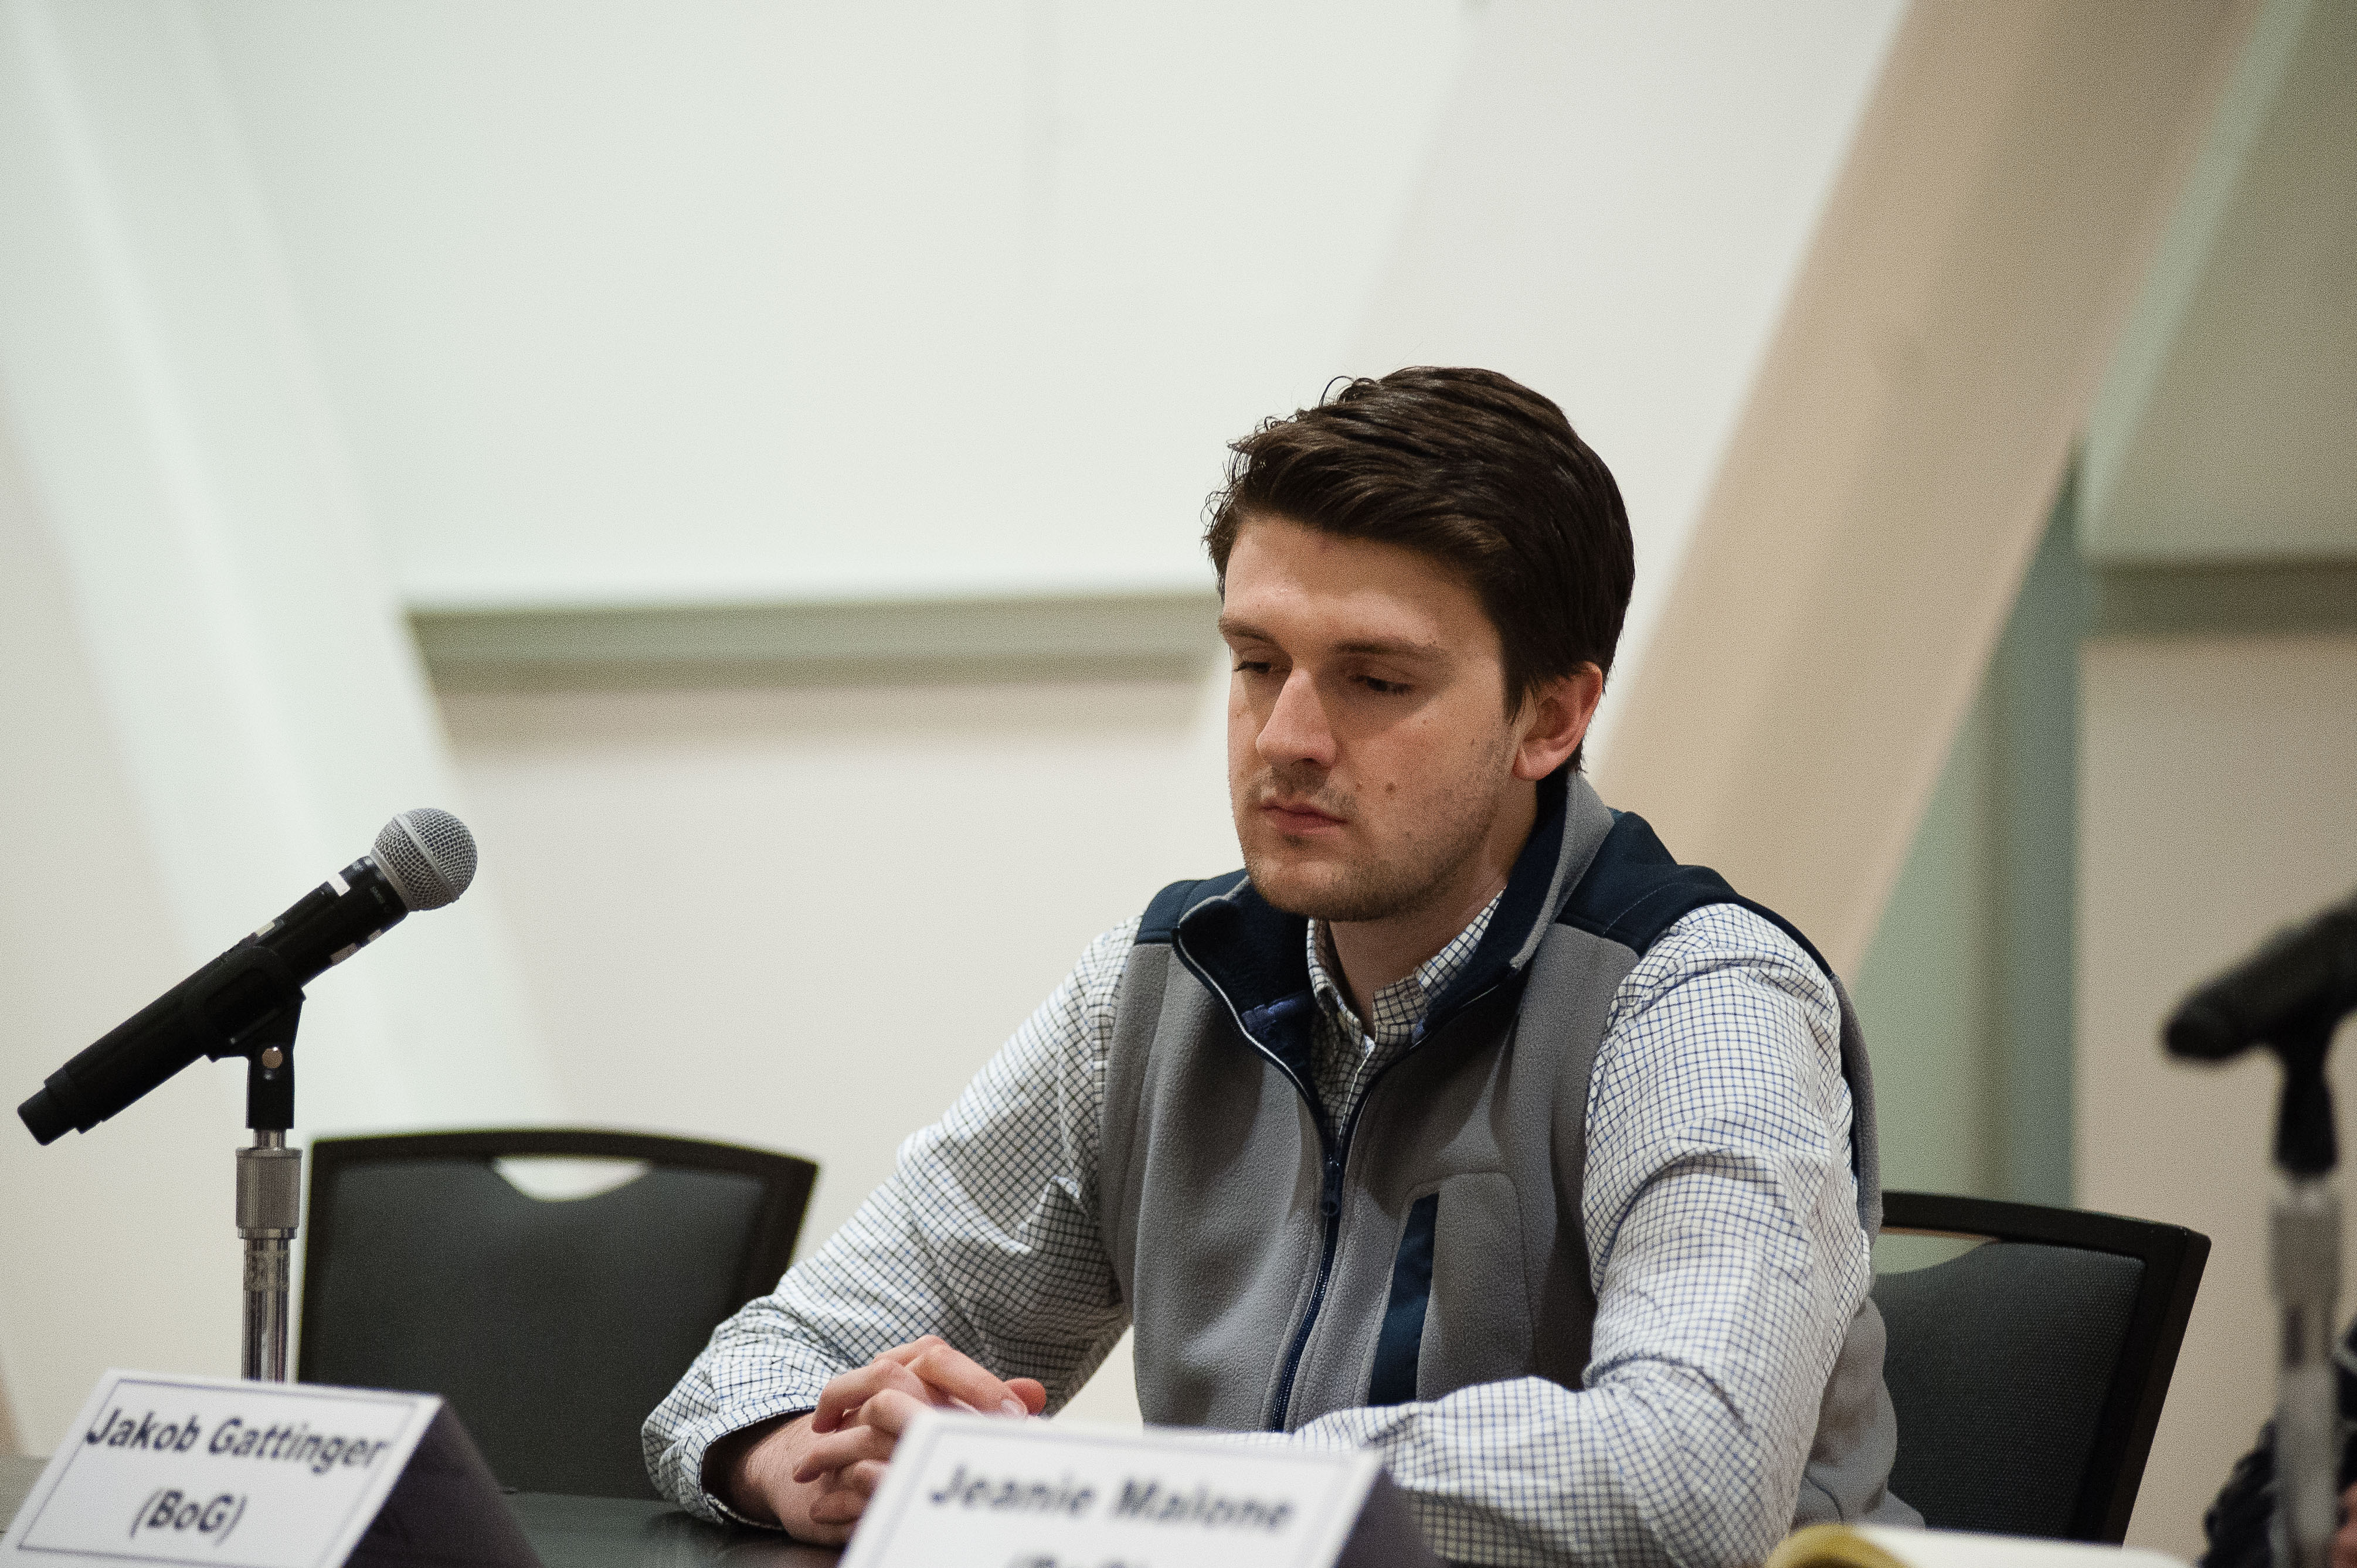 Newcomer Jakob Gattinger